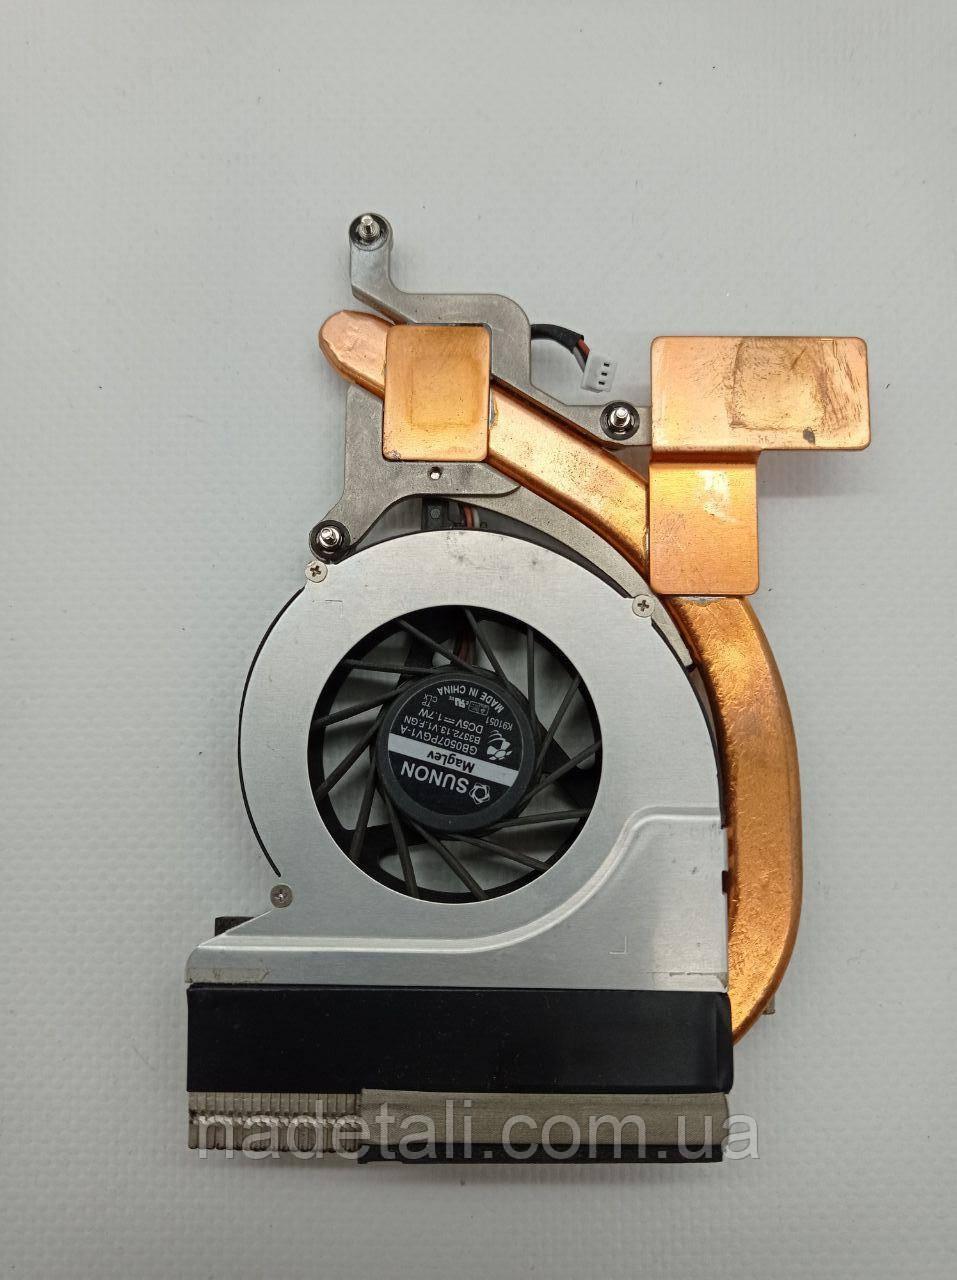 Система охлаждения Toshiba Satellite M305 SOL3EBU2TA0I